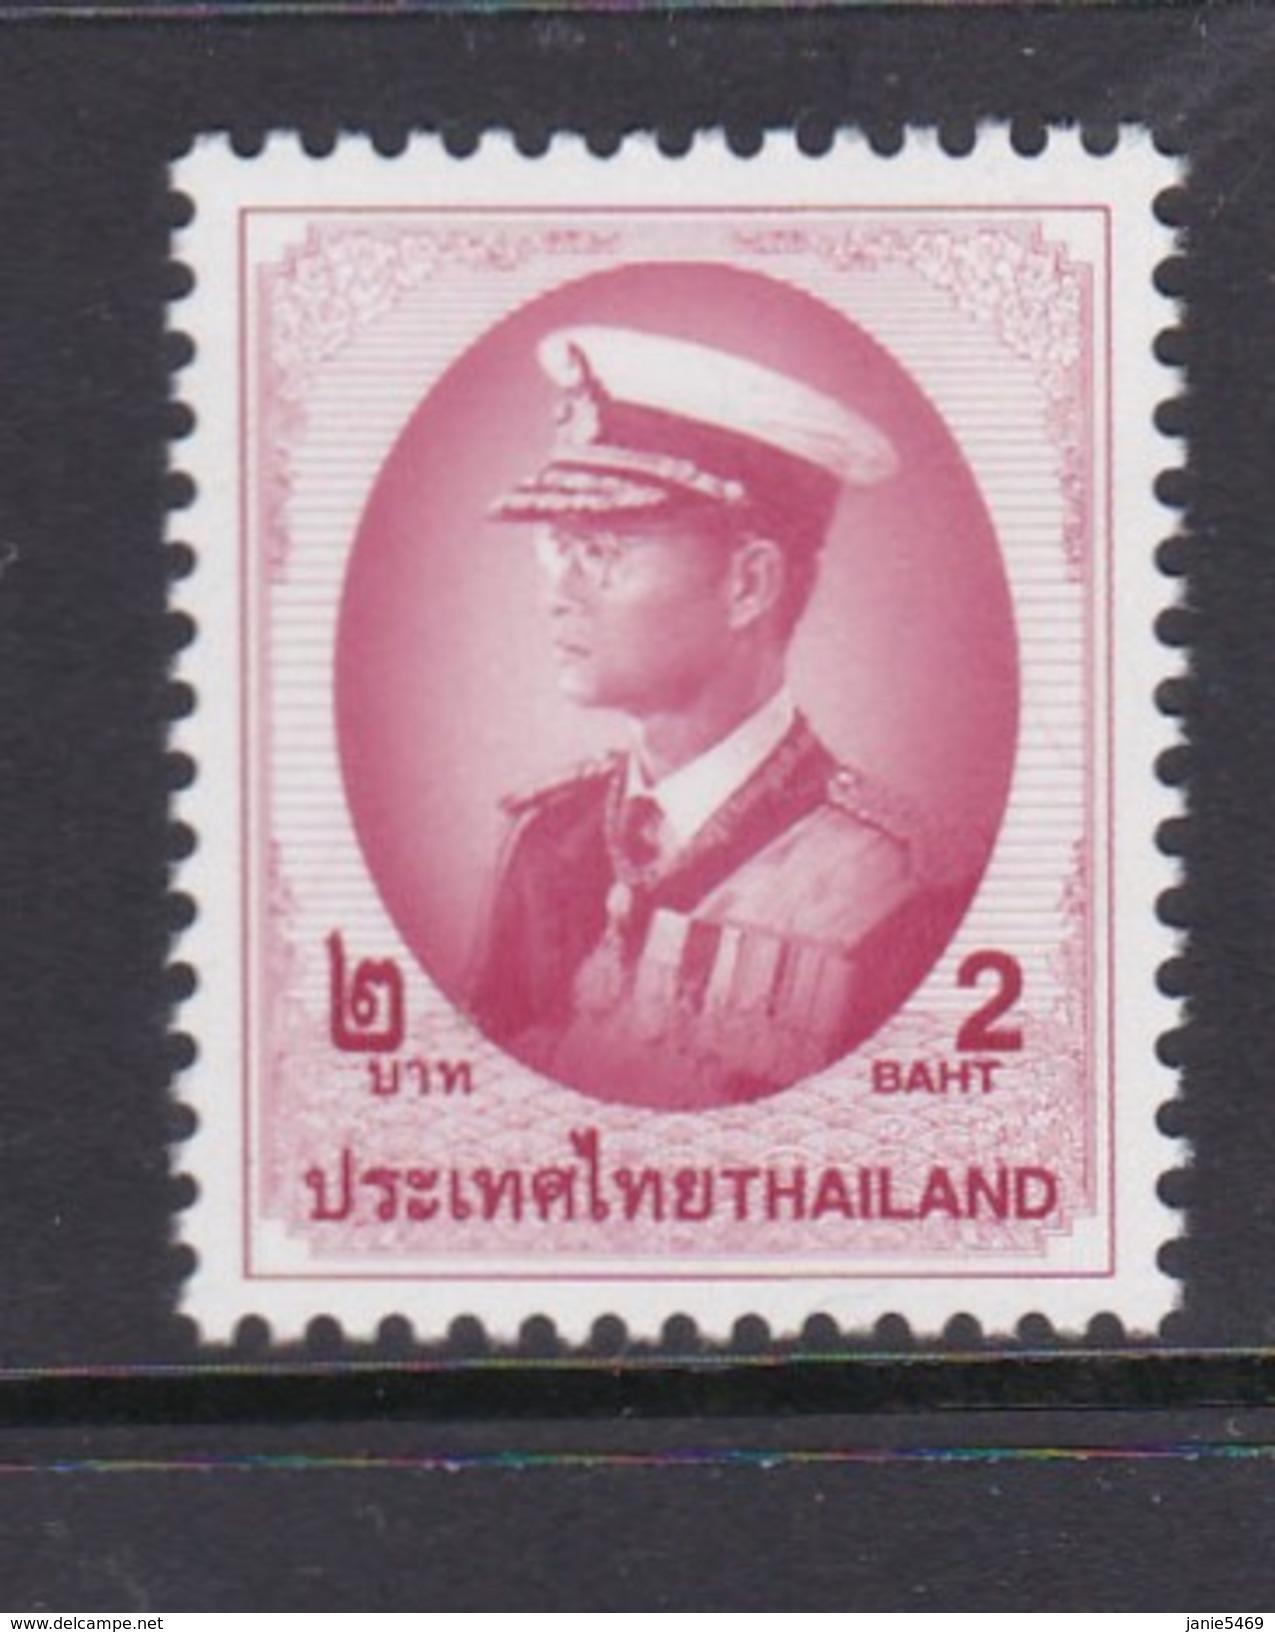 Thailand Scott 1801 1998 King Rama IX 2 Bath MNH - Thailand